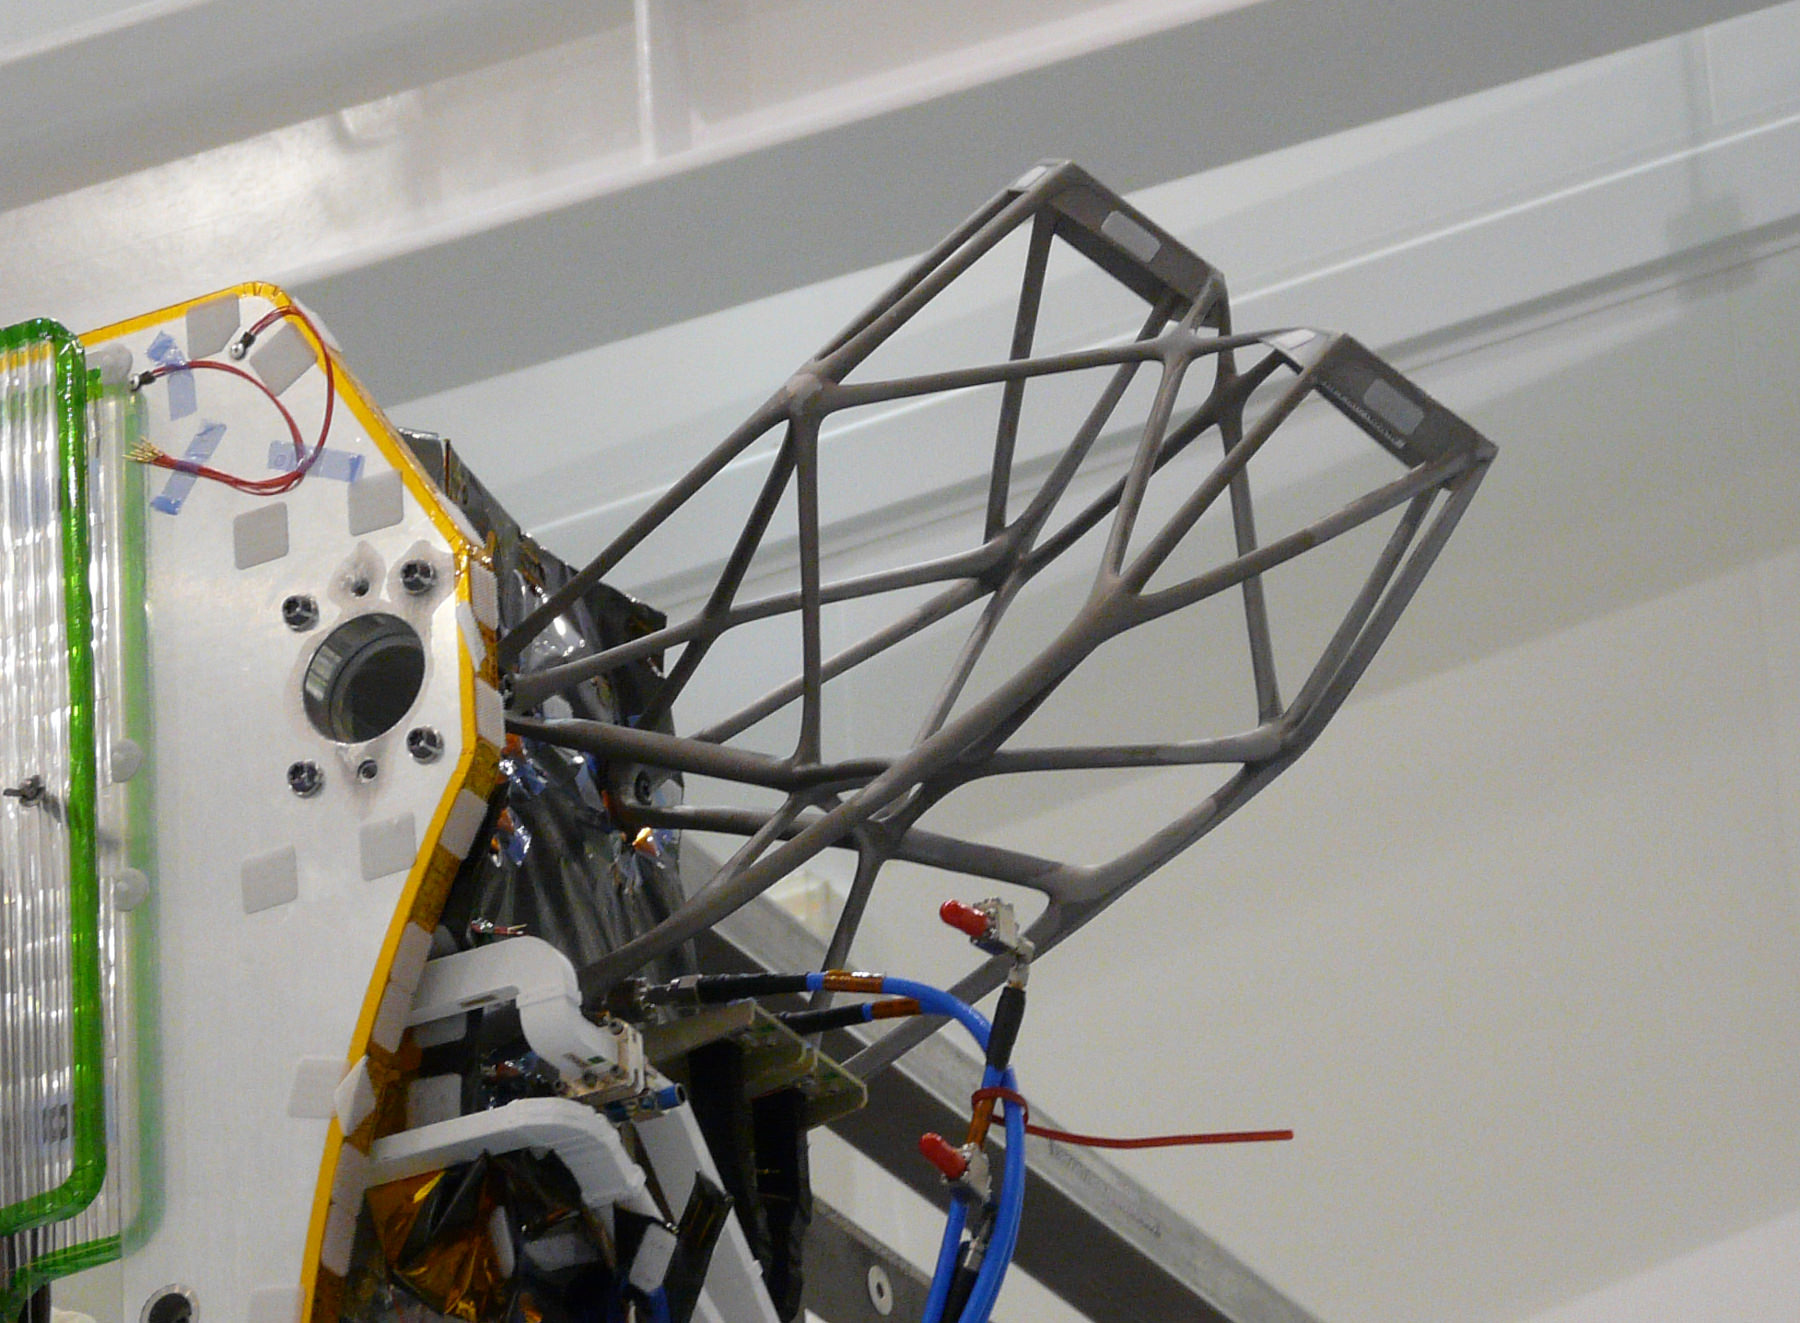 3d-metal-printed-parts-satellites-3